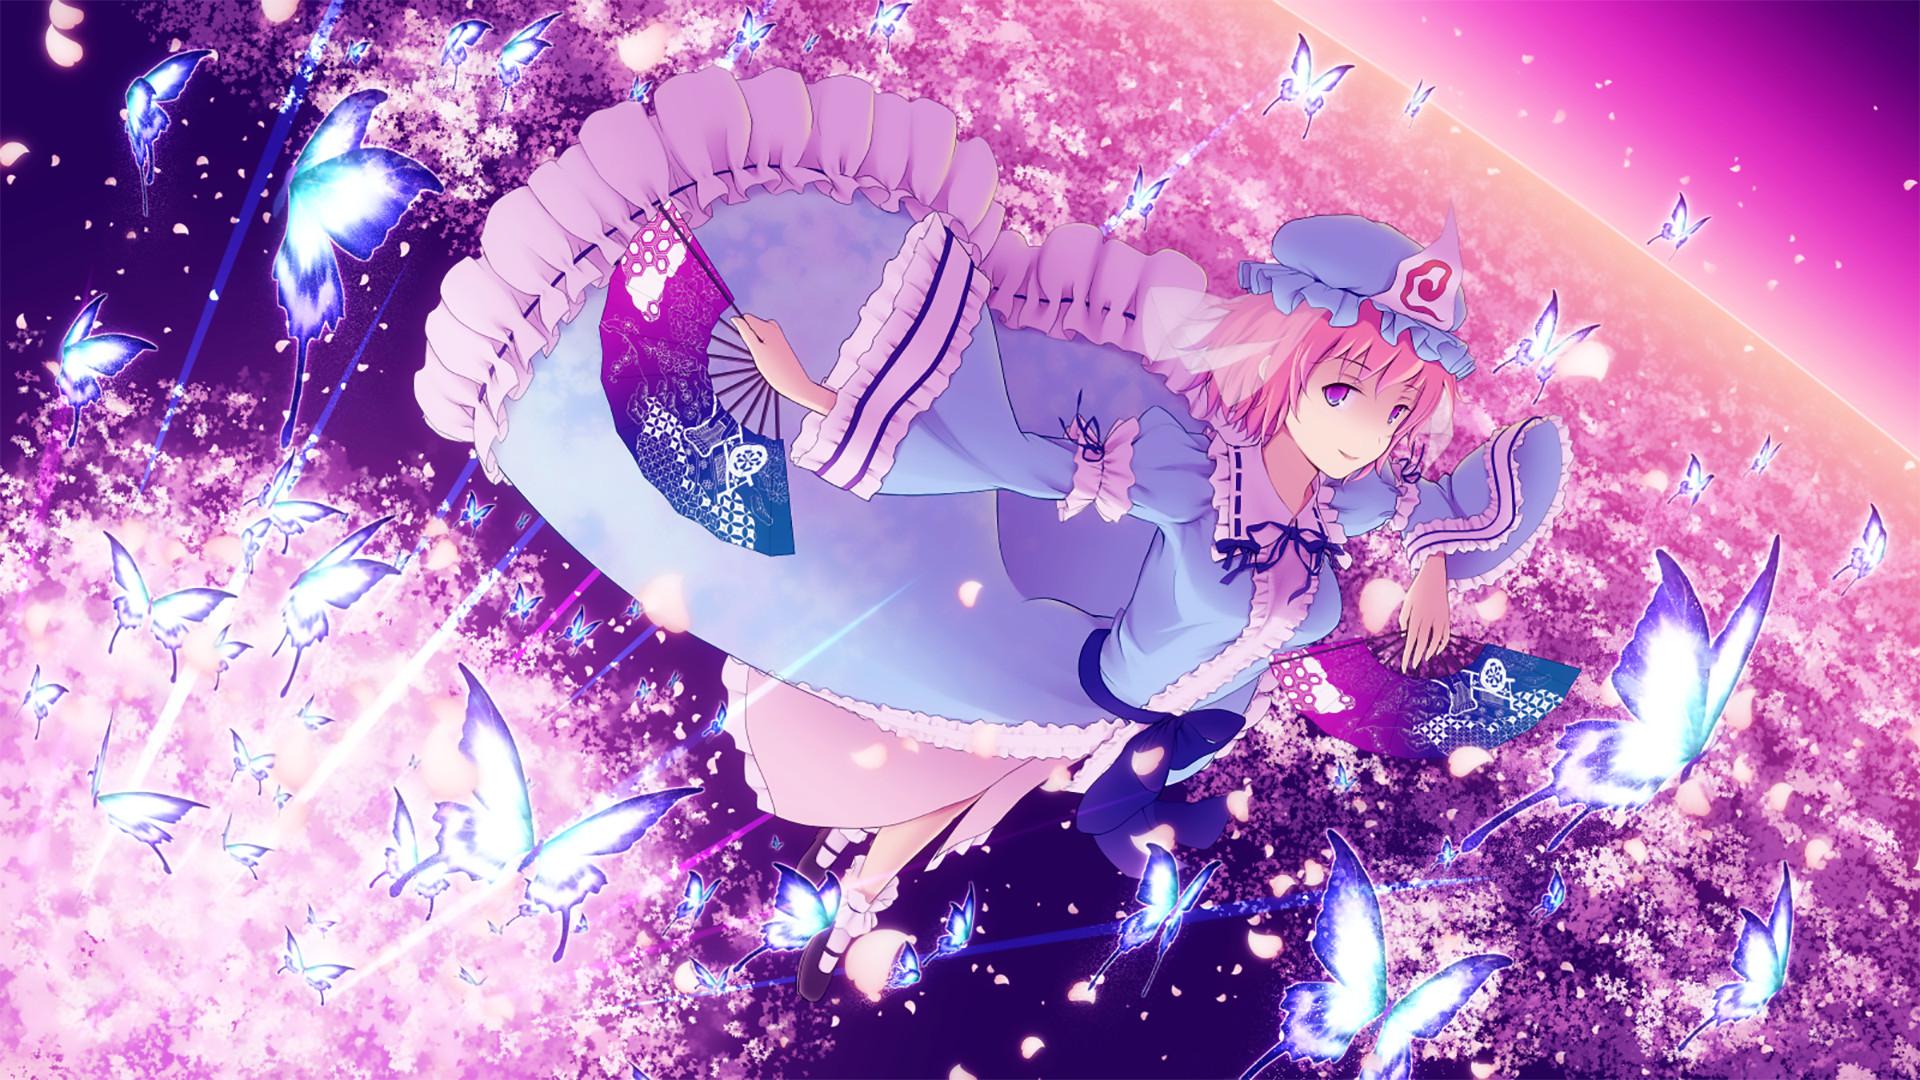 Angry Tenshi Hinanawi, Touhou wallpaper   Touhou, Anime Wallpapers    Pinterest   Wallpaper and Anime art